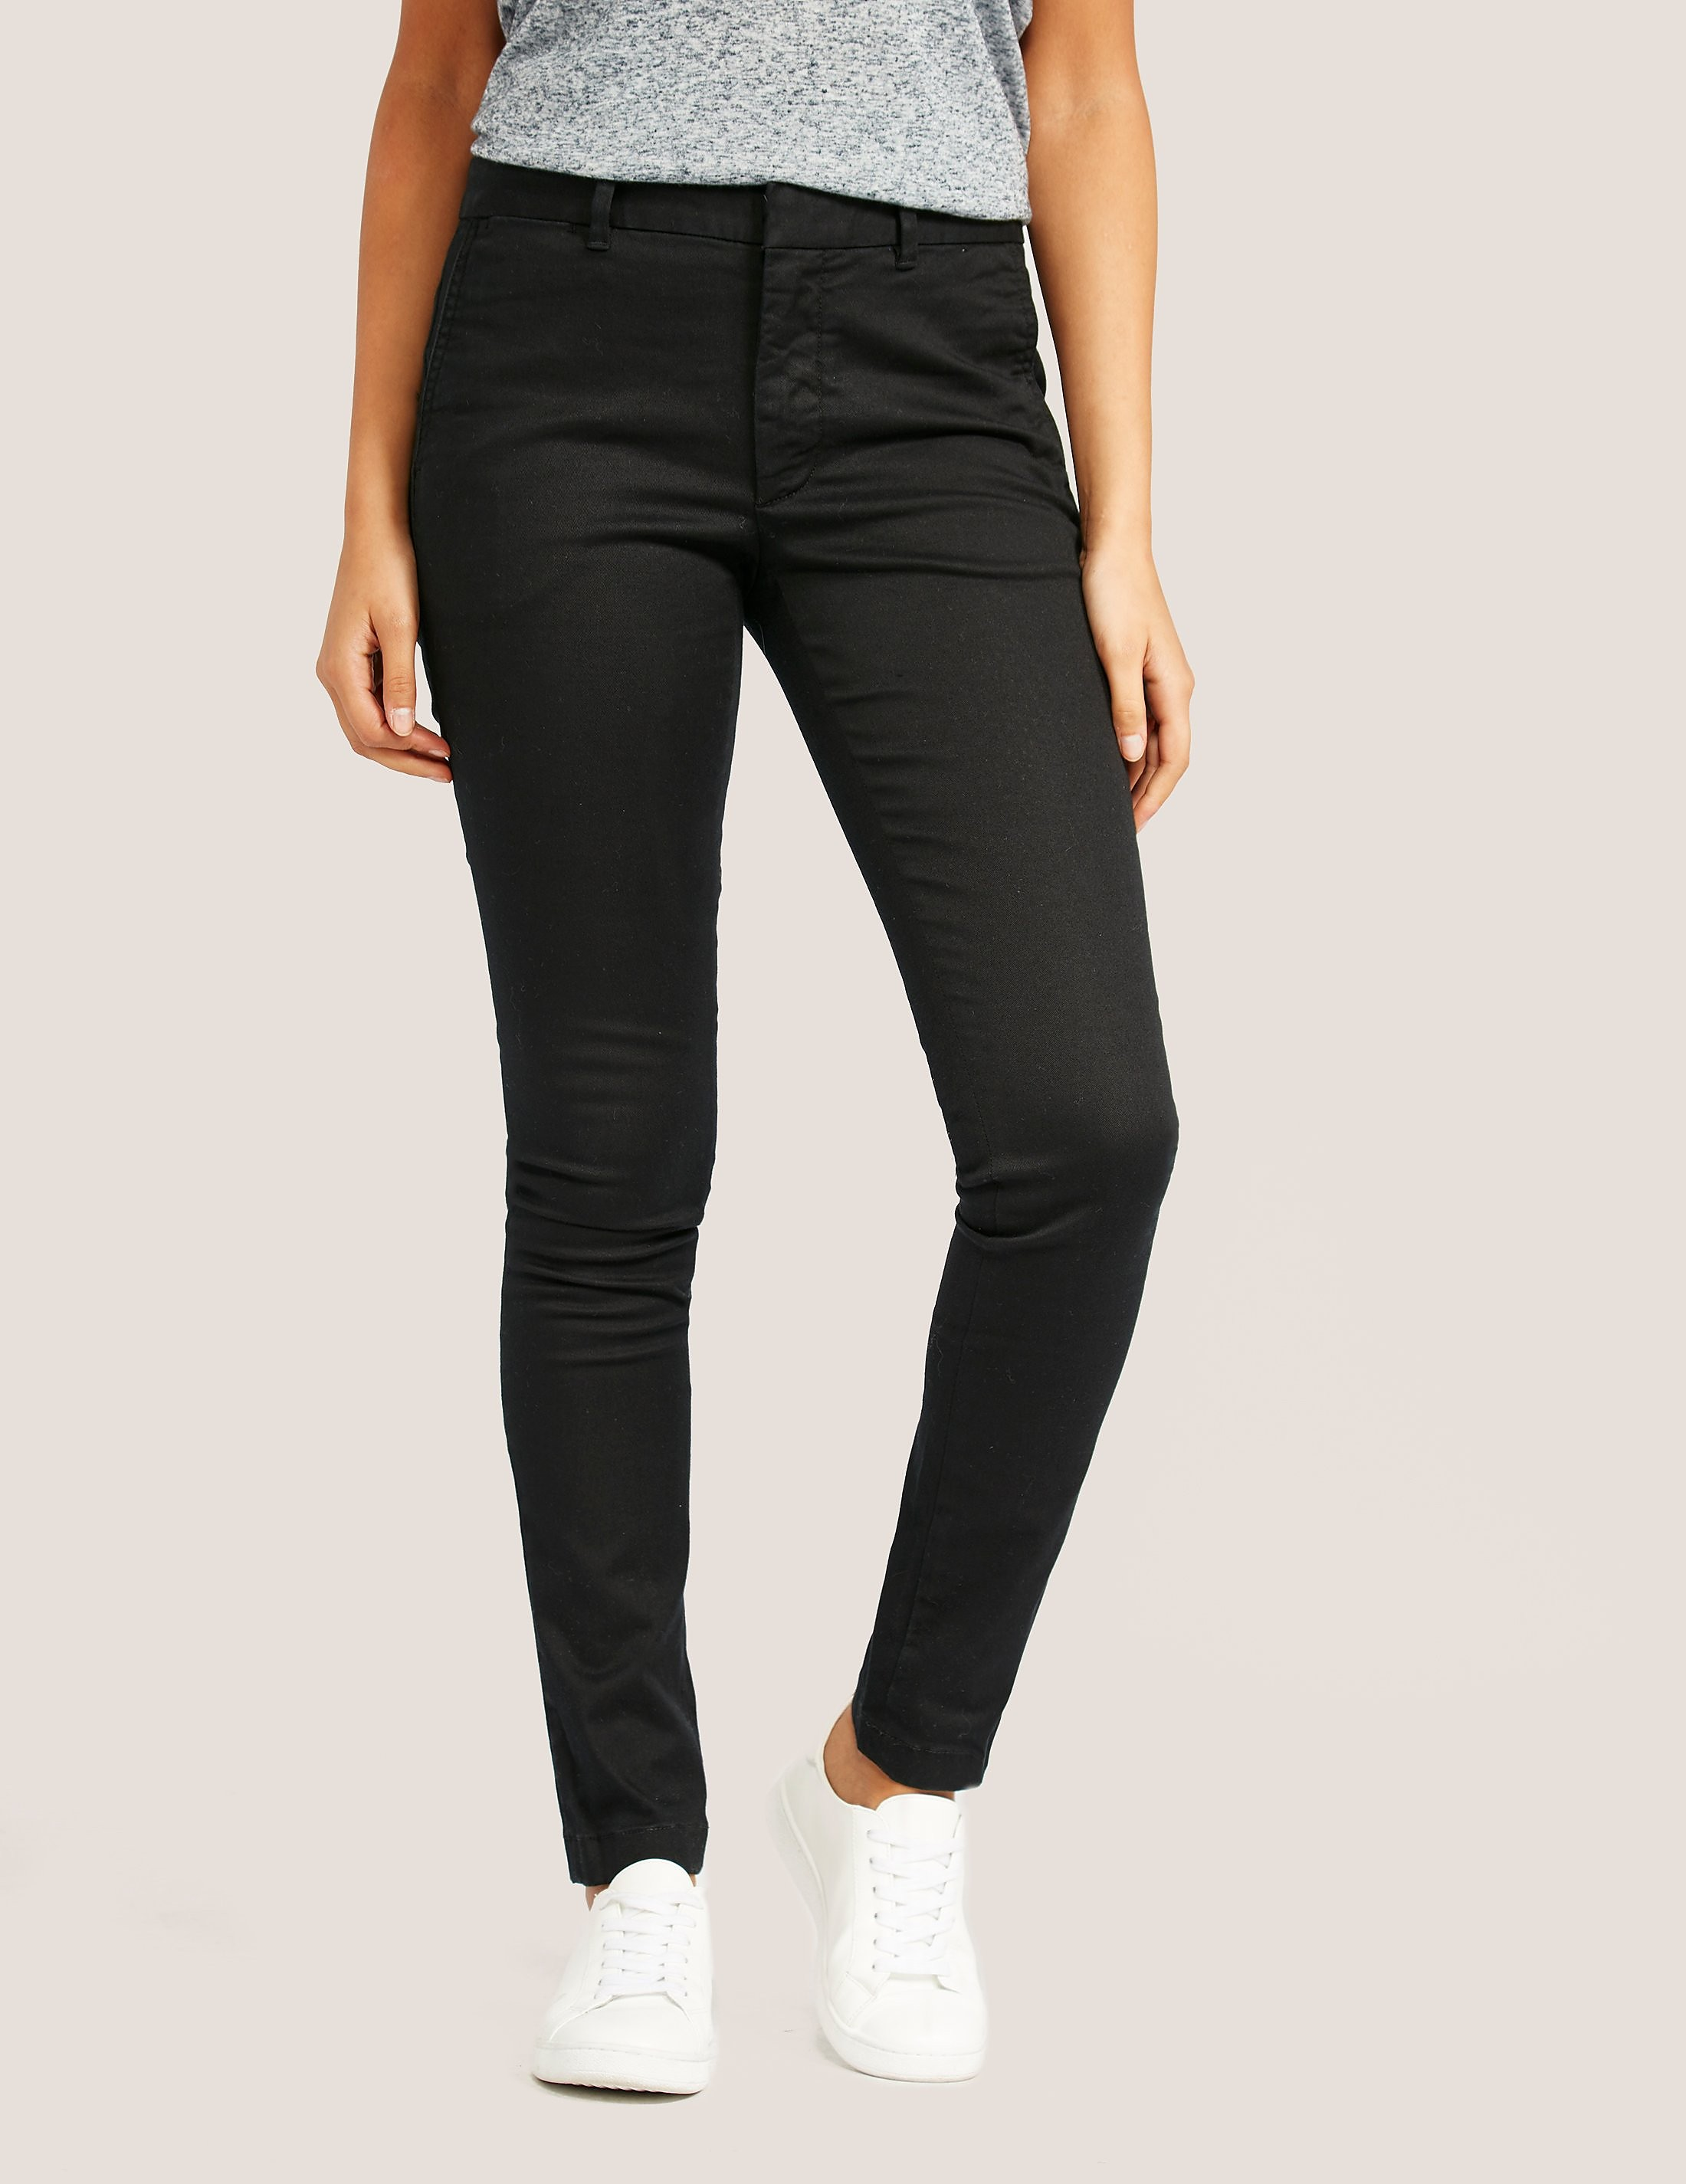 Polo Ralph Lauren Brook Skinny Pants